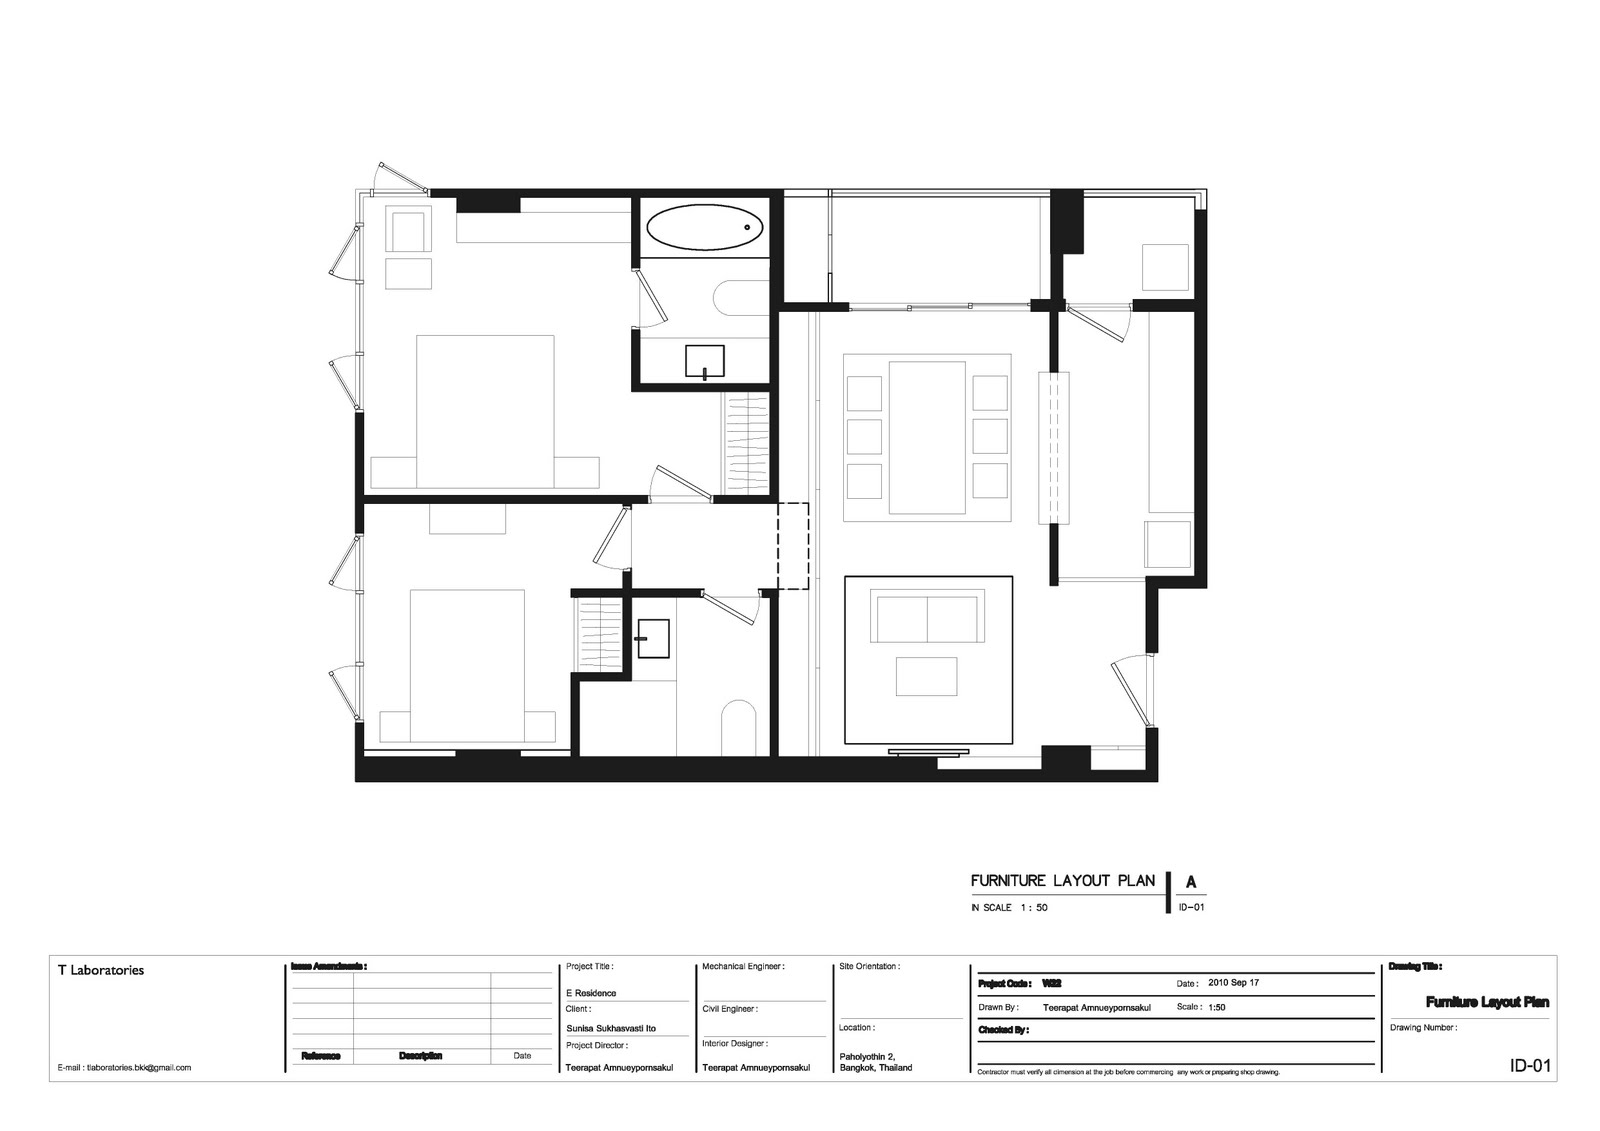 Furniture Layout Plan Building Drawing Tools Design